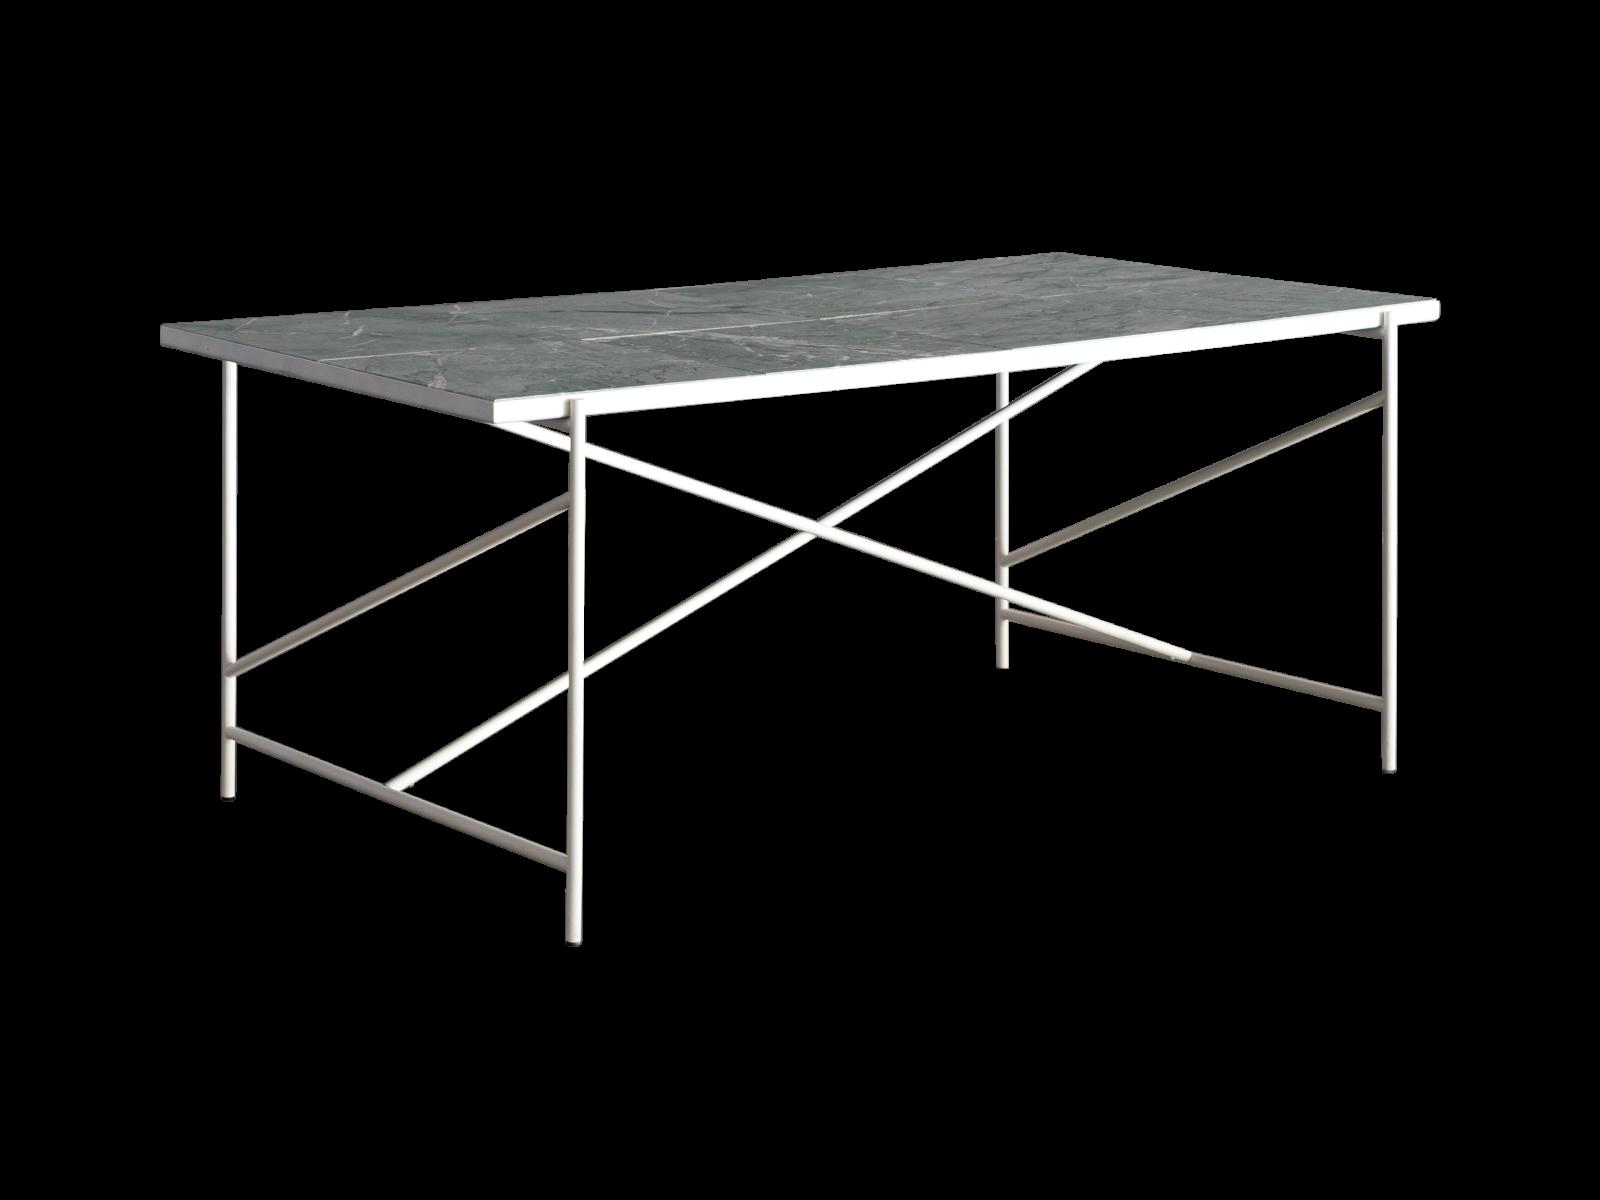 Handvärk Dining Table Dolceacqua Marble, White Base, 185 cm